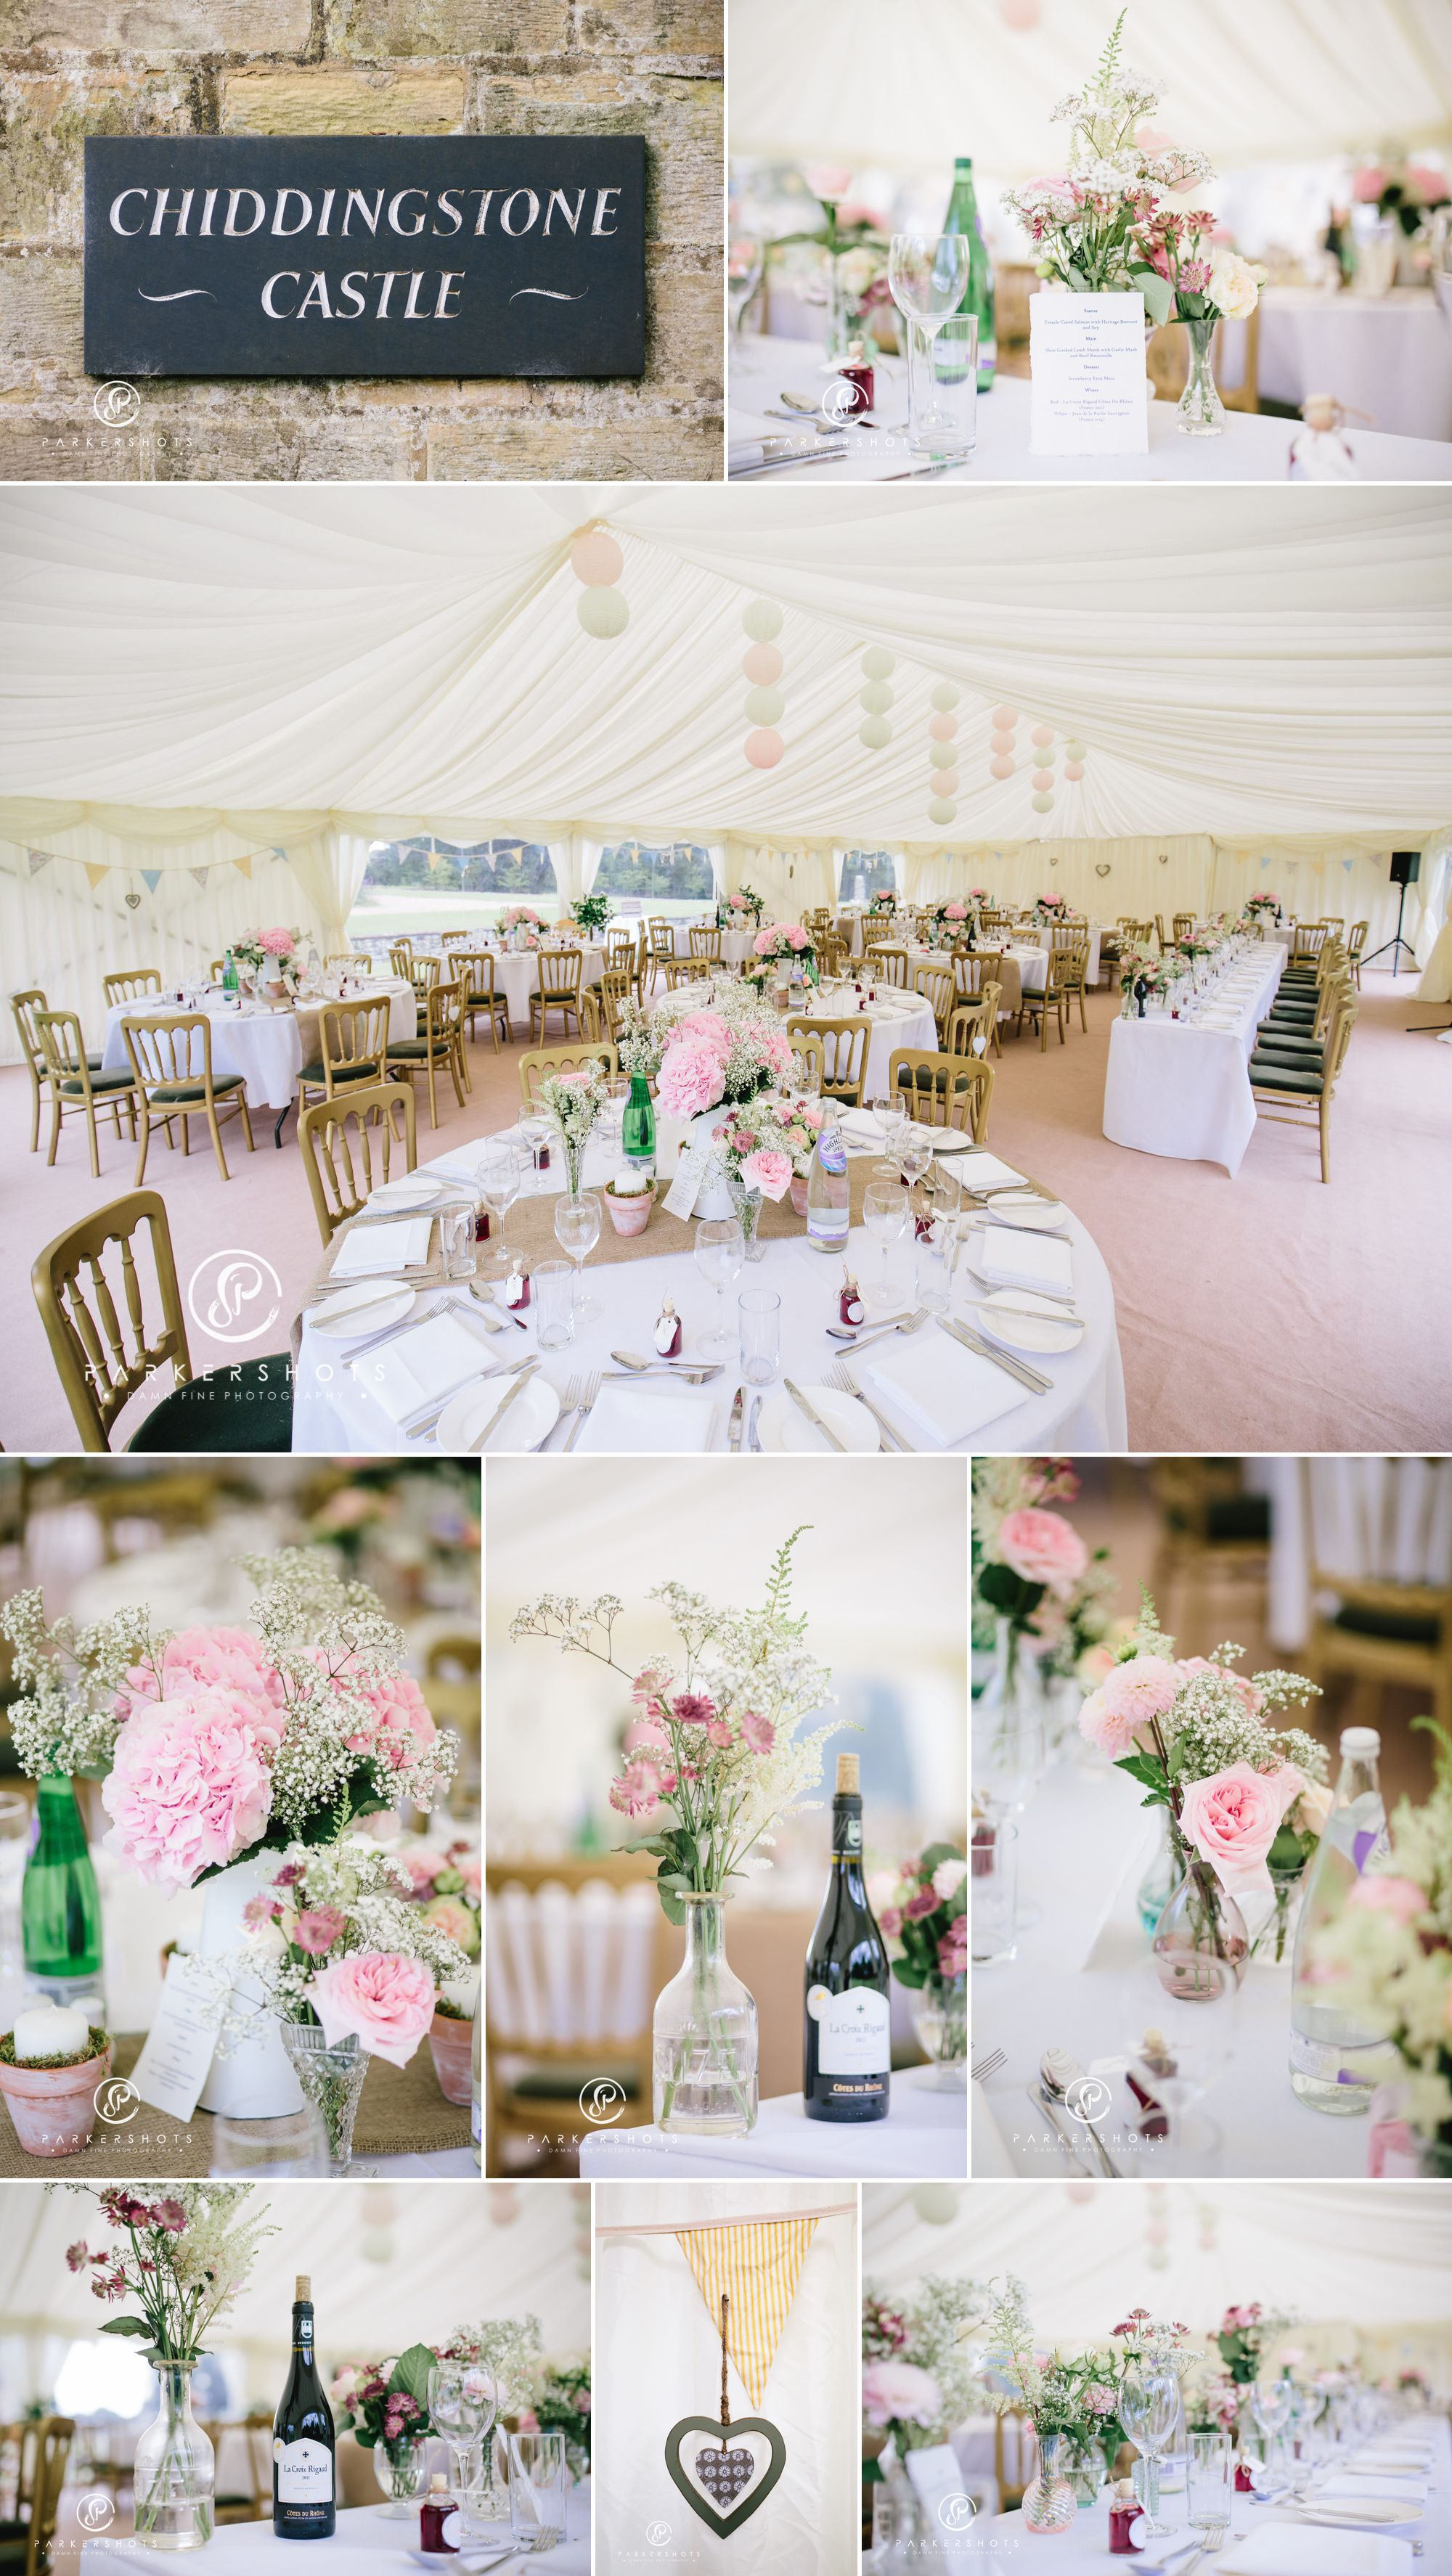 Chiddingstone_Castle_Wedding_Photographer 10